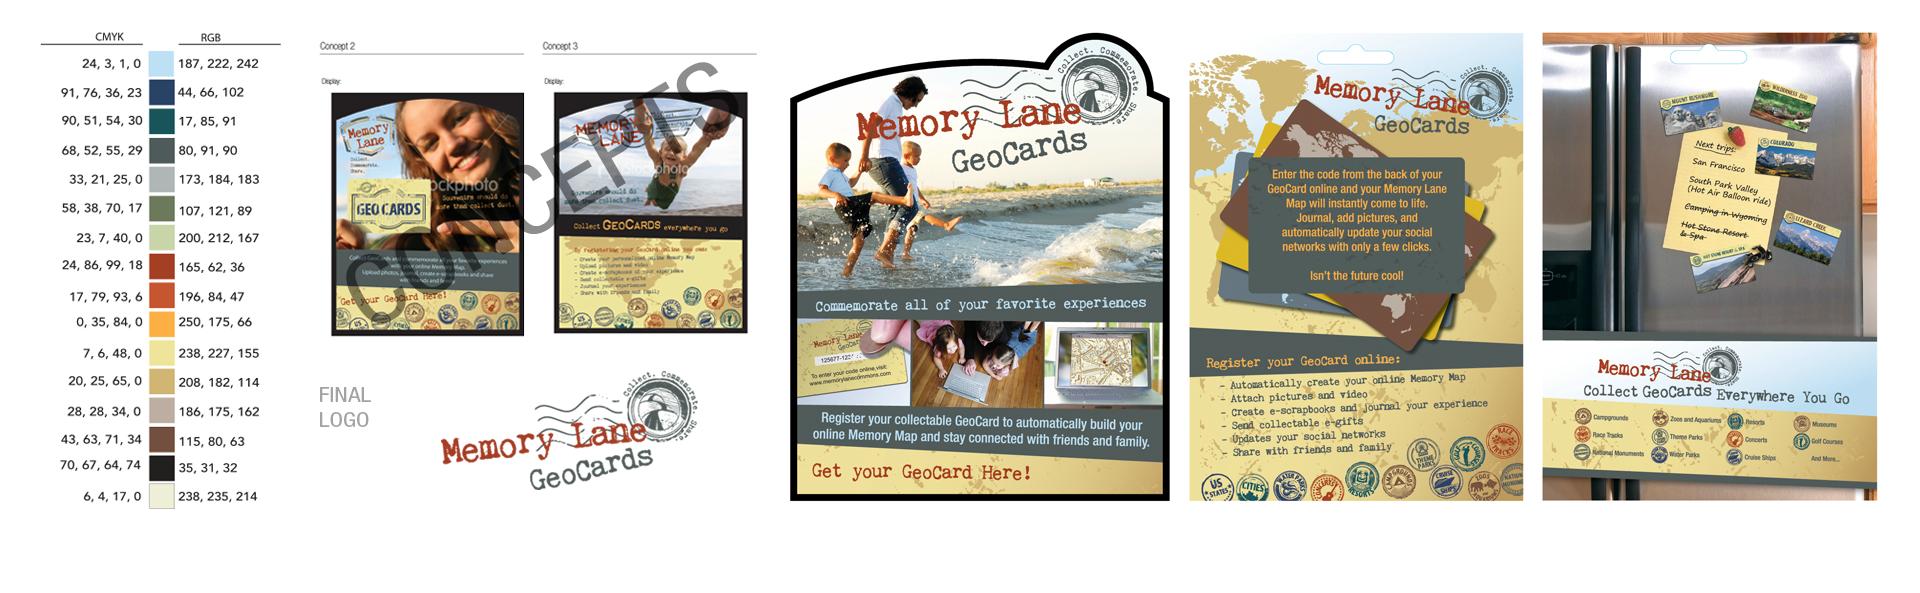 Memory Lane - Logo, Brand, Stamps, Product Displays & More